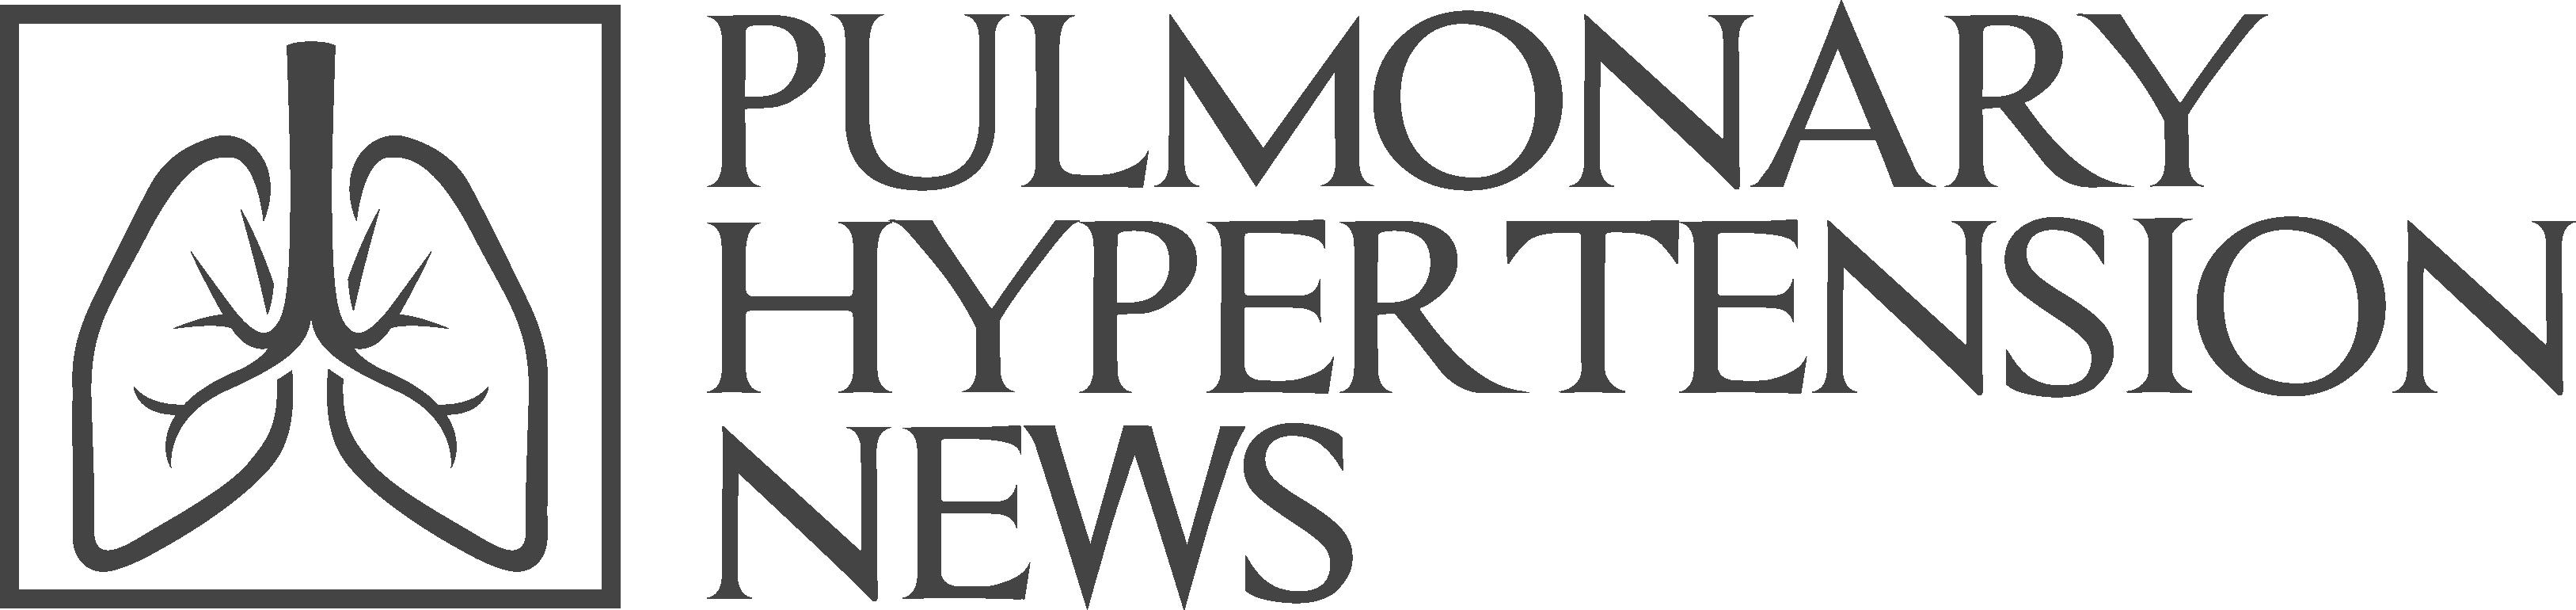 Pulmonary Hypertension Life Expectancy